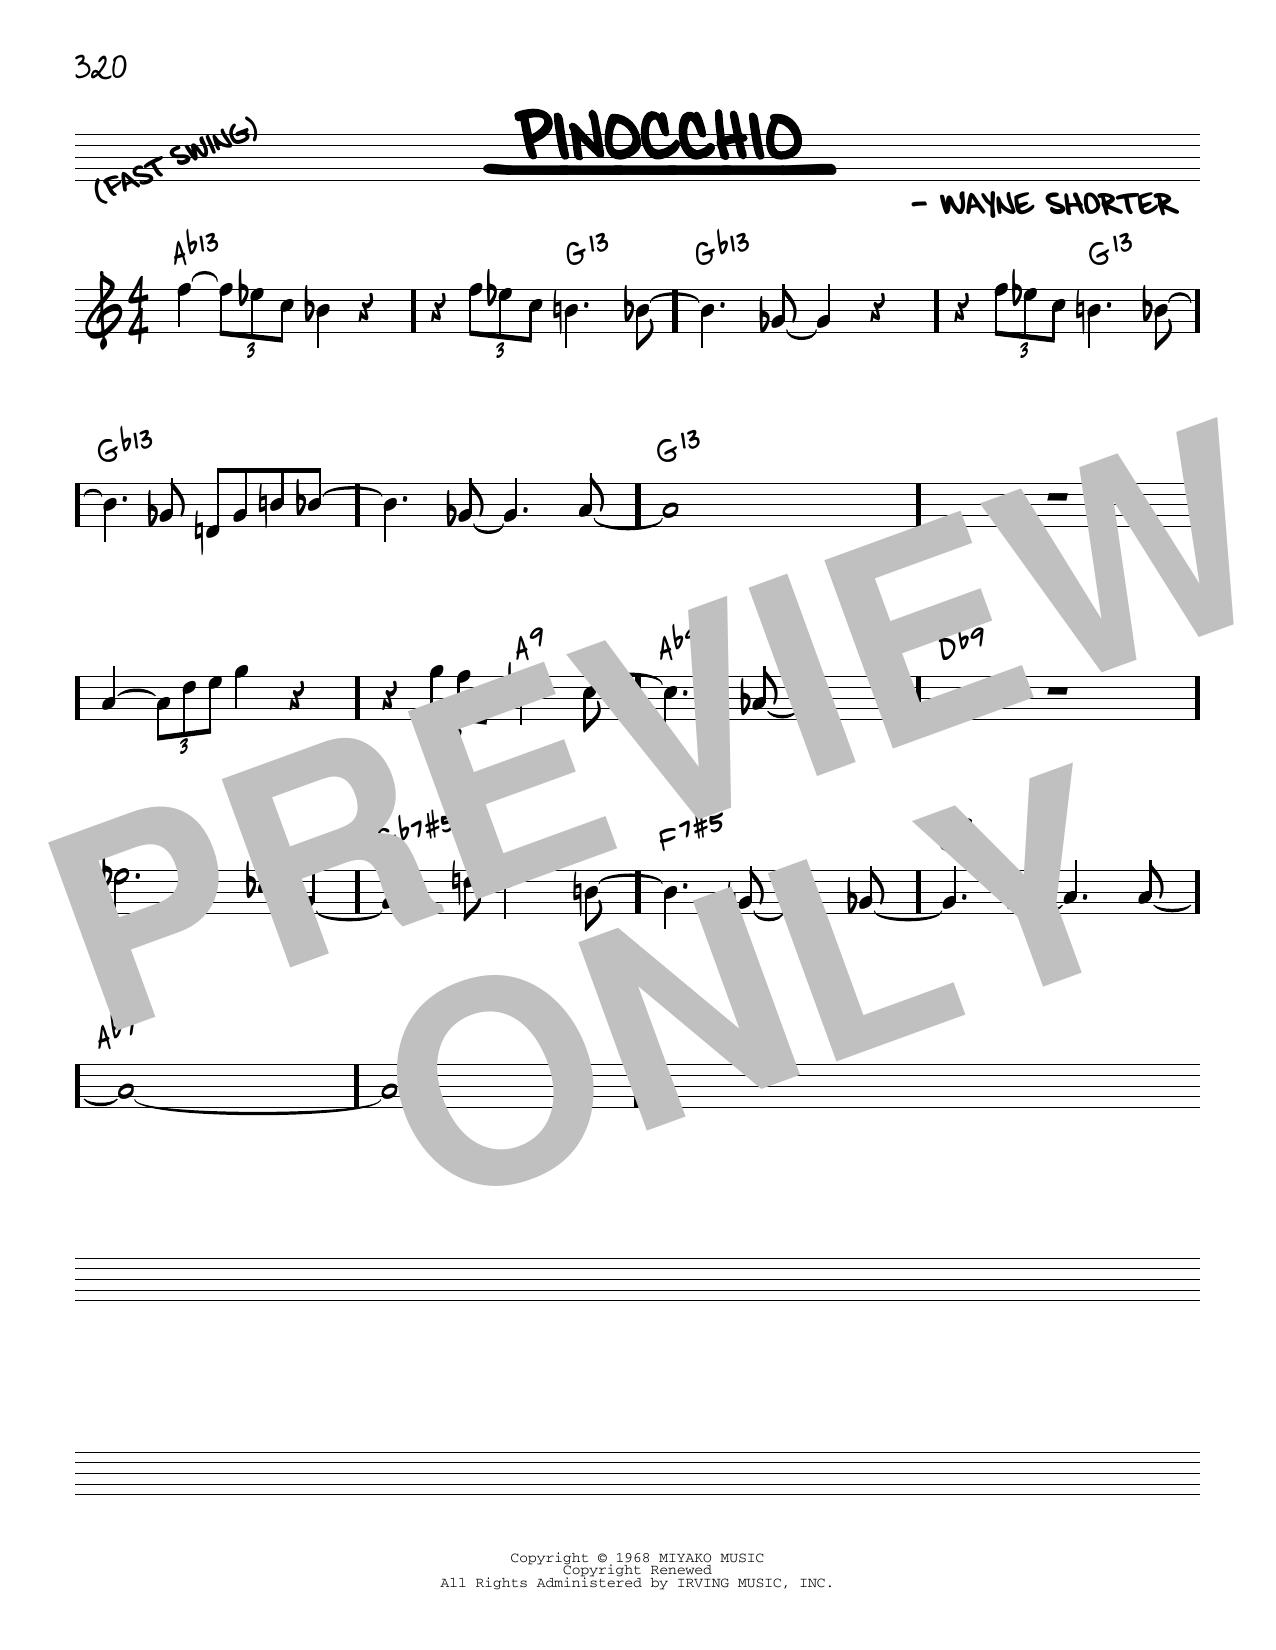 Wayne Shorter Pinocchio [Reharmonized version] (arr. Jack Grassel) sheet music notes printable PDF score